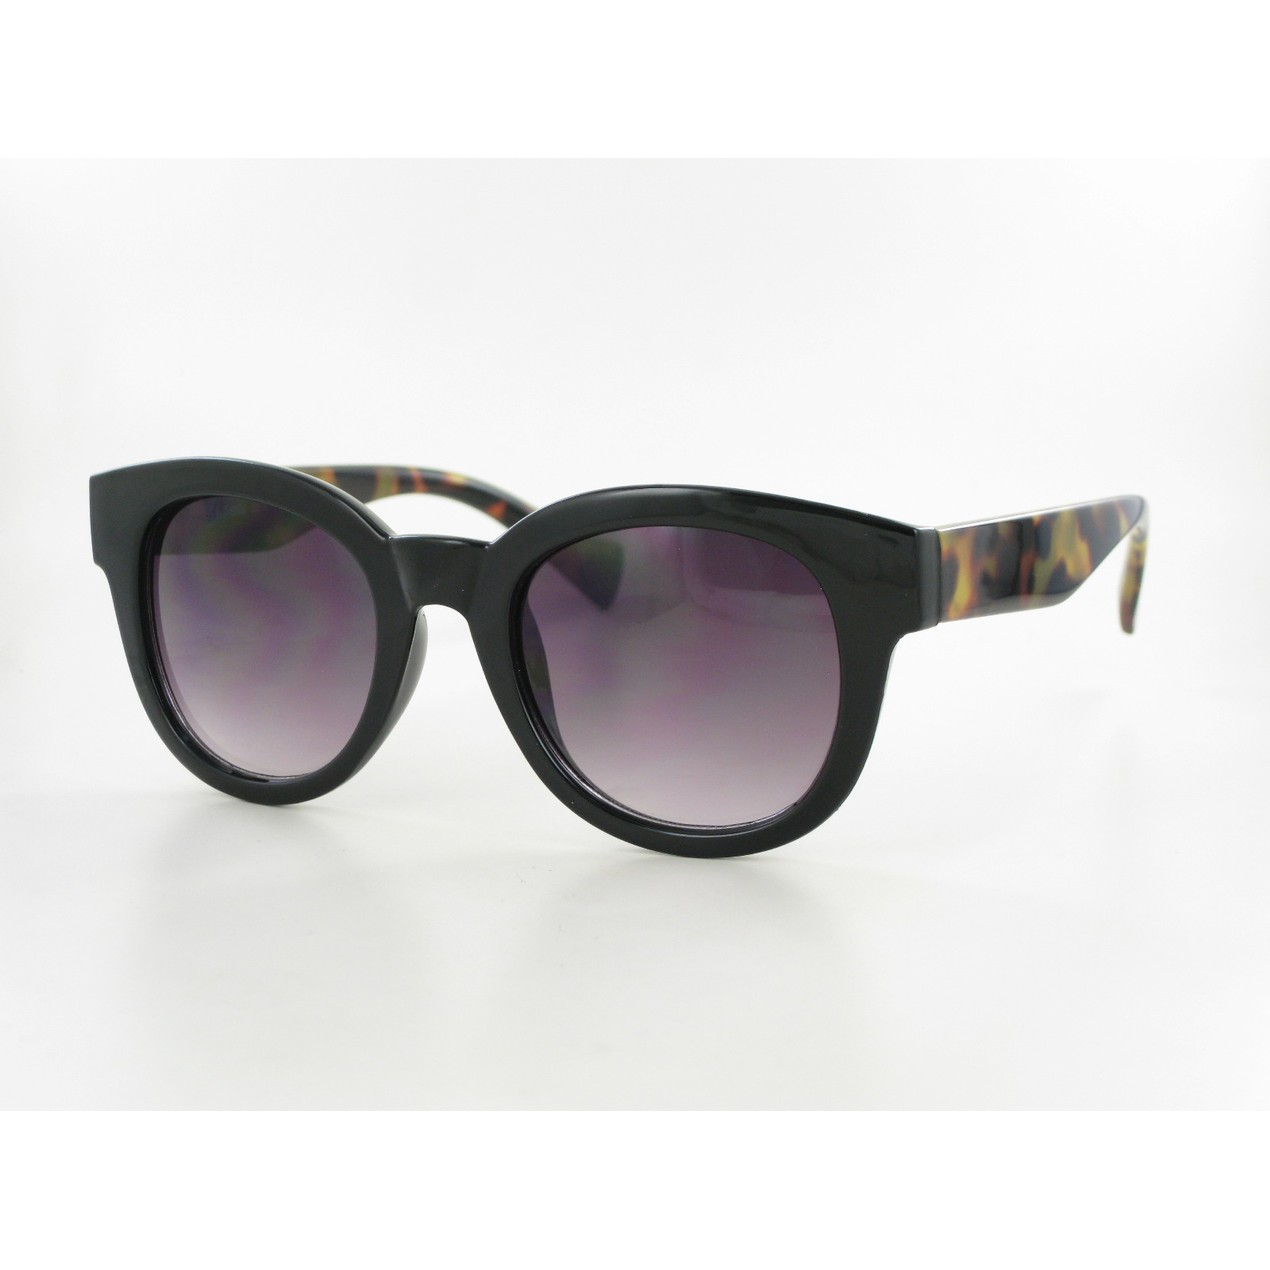 b68c8a80b2 Women s Sunglasses by Kay Unger - Tanga